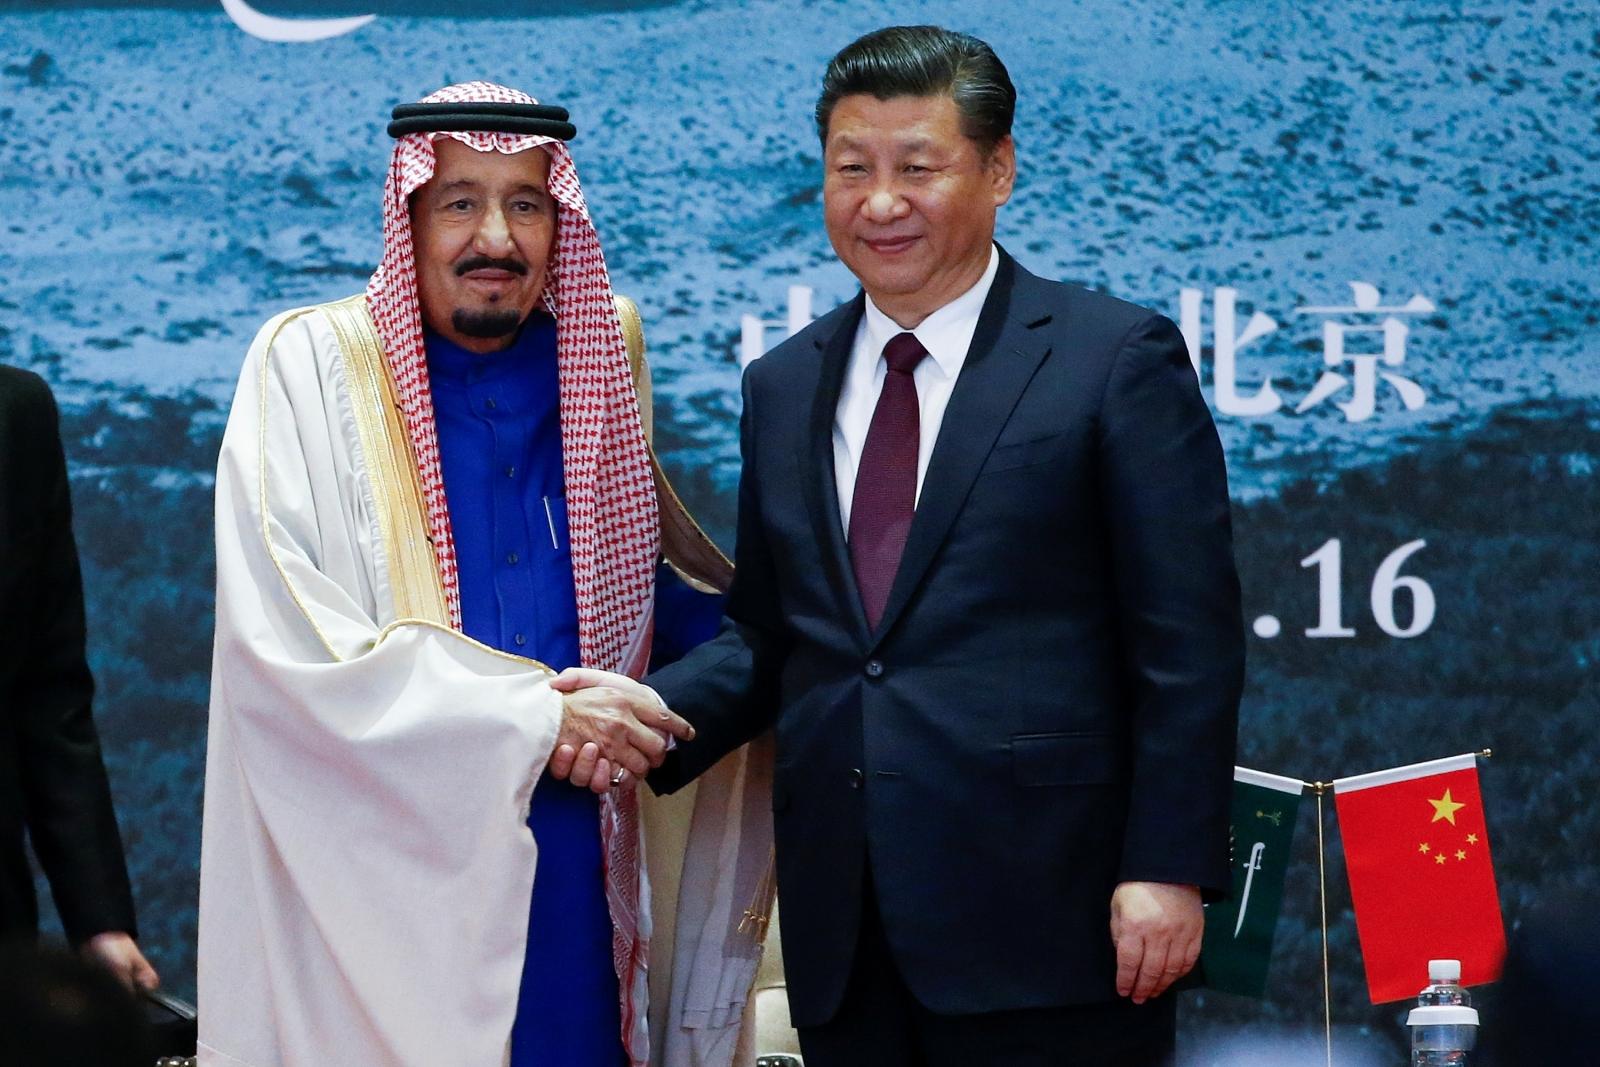 China's President Xi Jinping  and Saudi Arabia's king Salman bin Abdulaziz Al-Saud